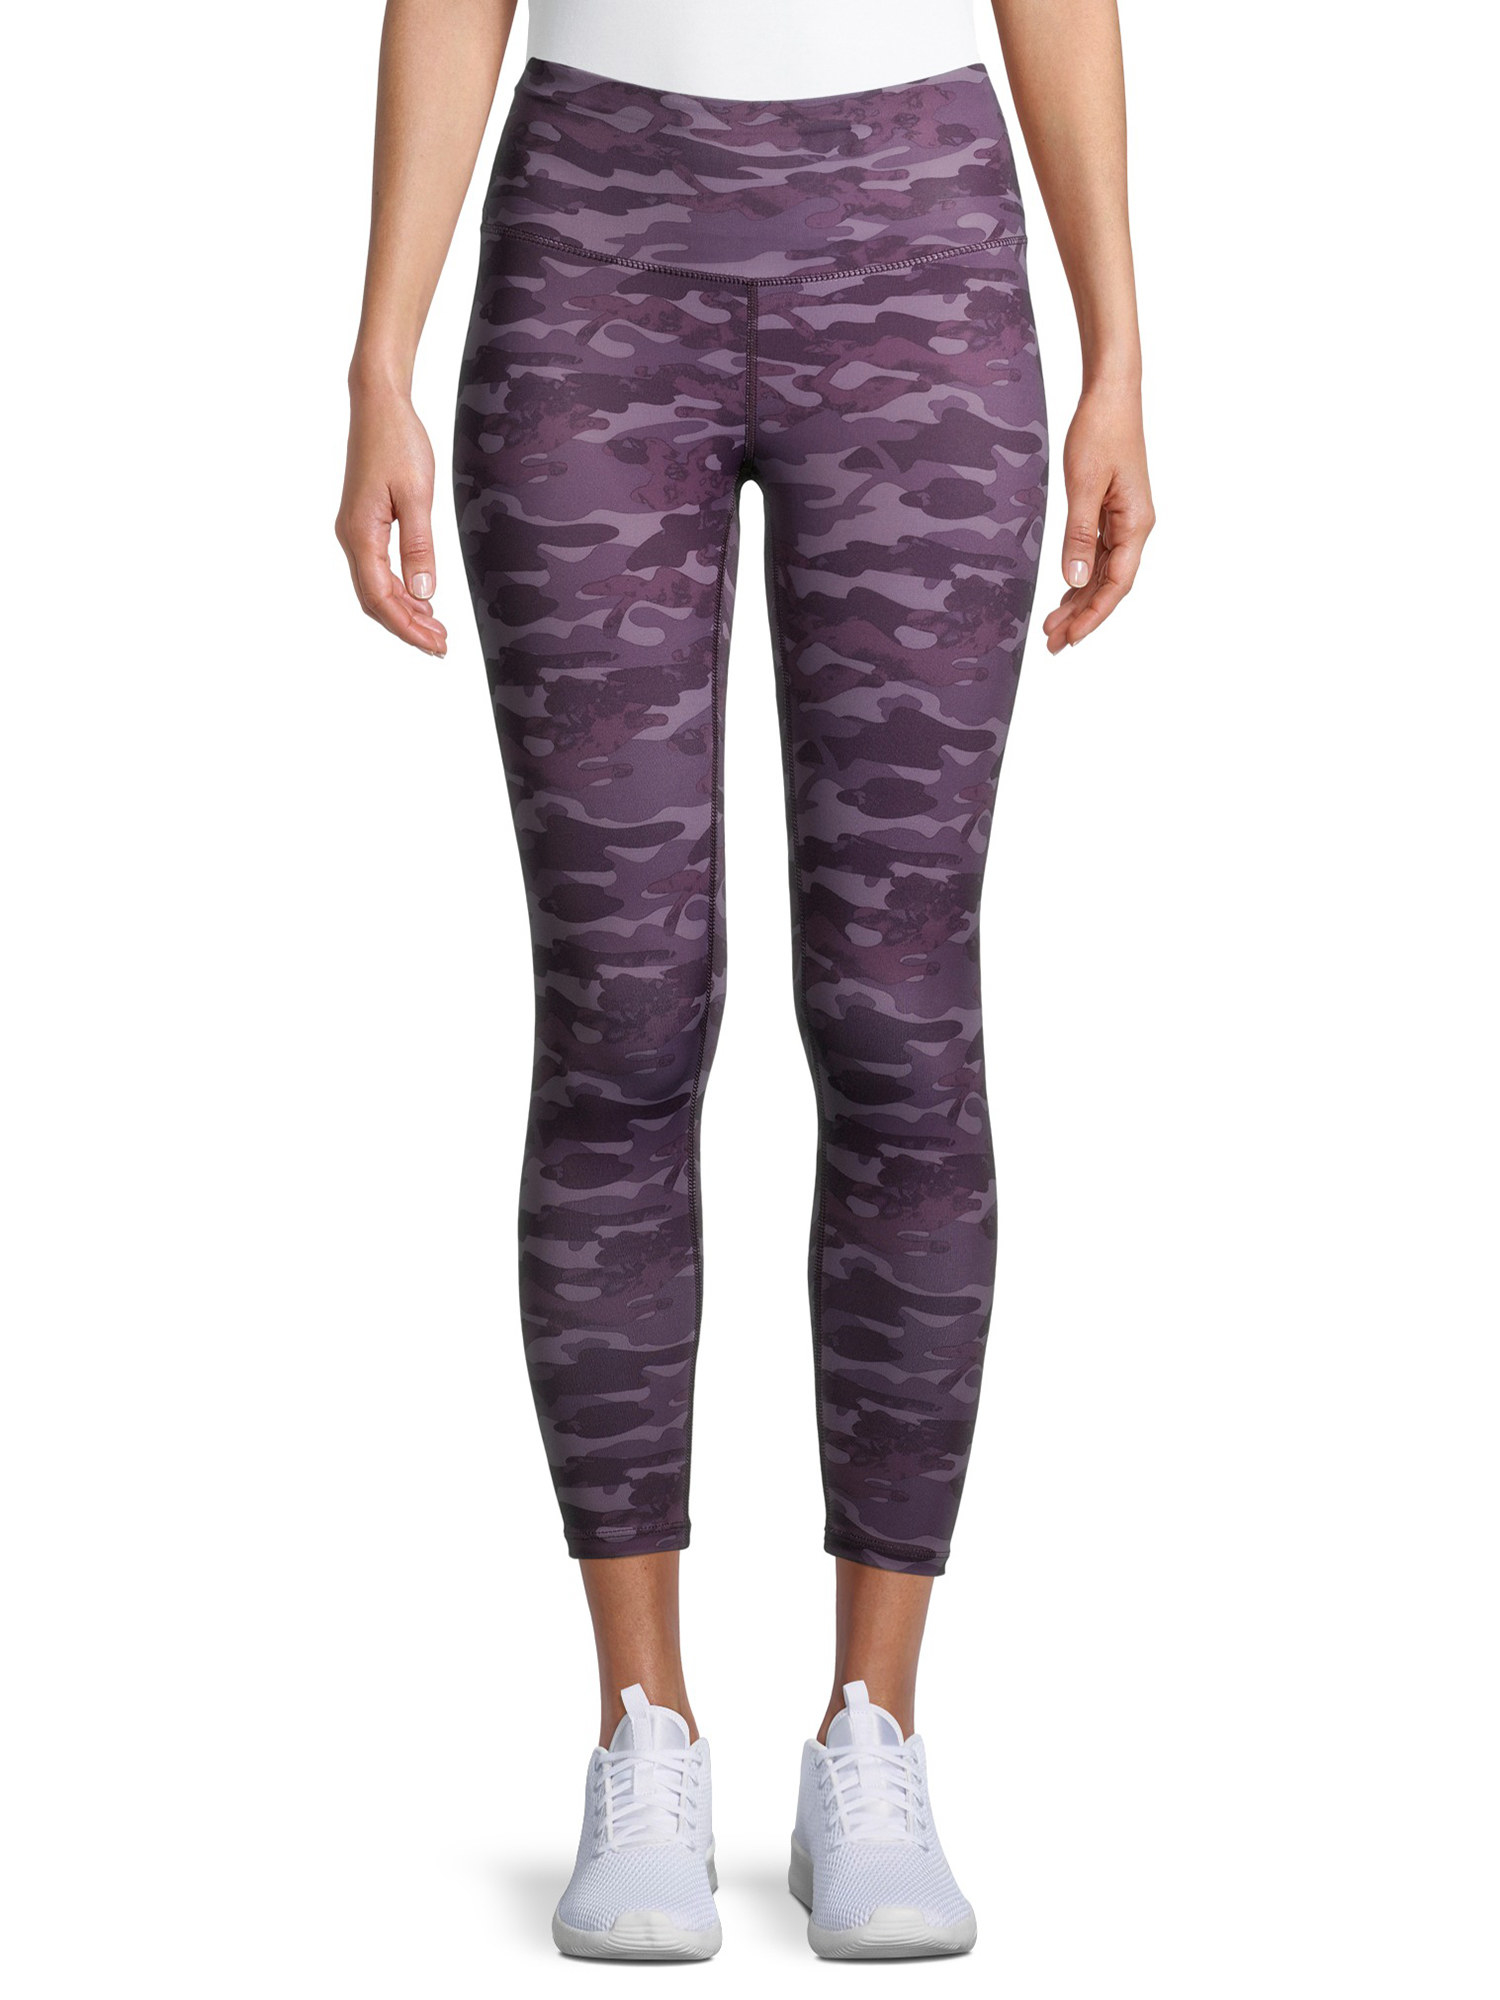 the leggings in purple camo